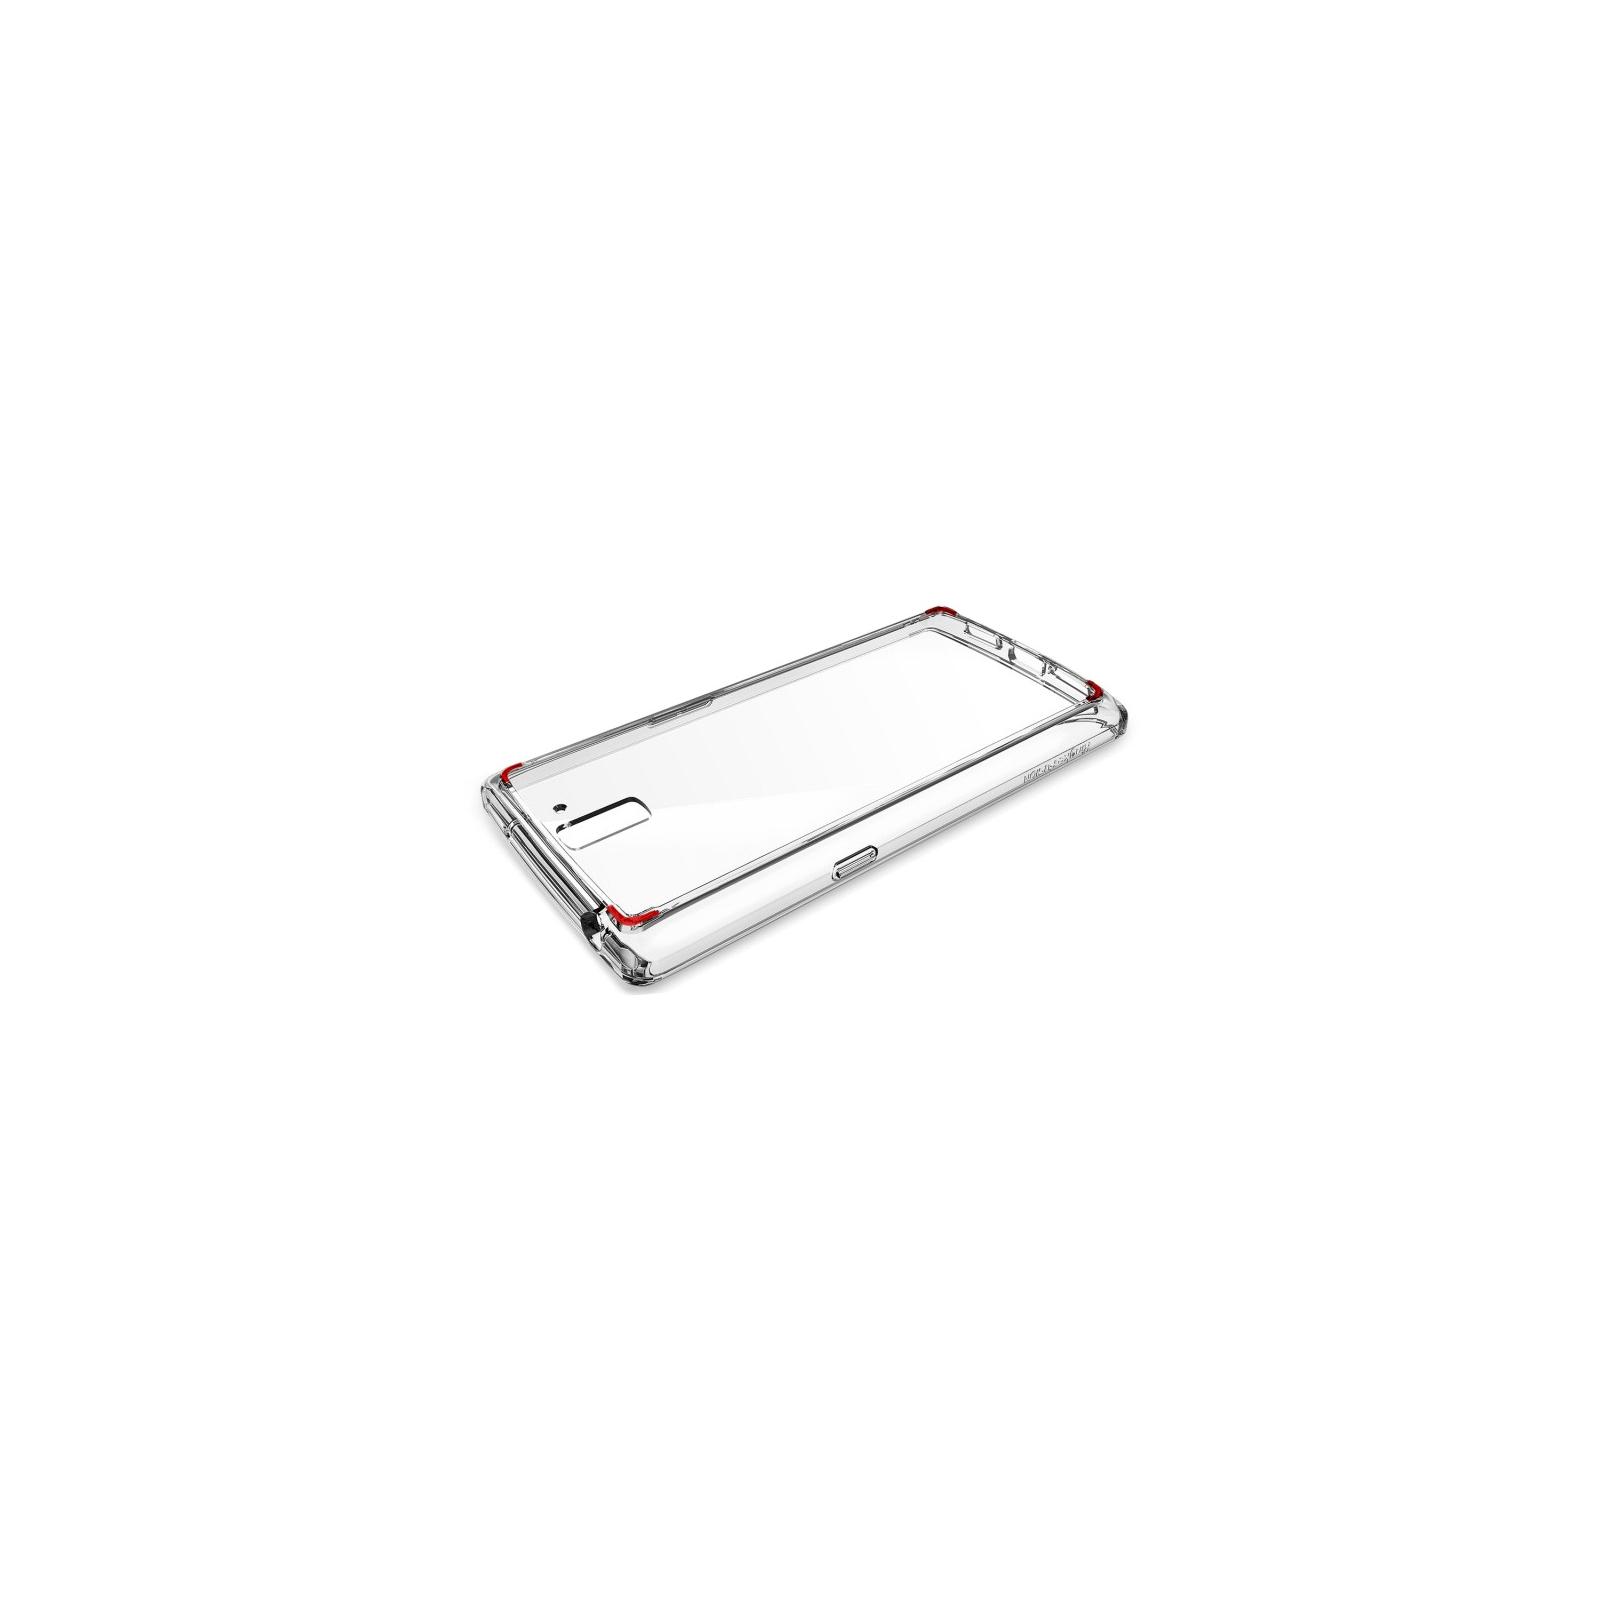 Чехол для моб. телефона Ringke Fusion для HTC OnePlus One (Crystal View) (159750) изображение 2